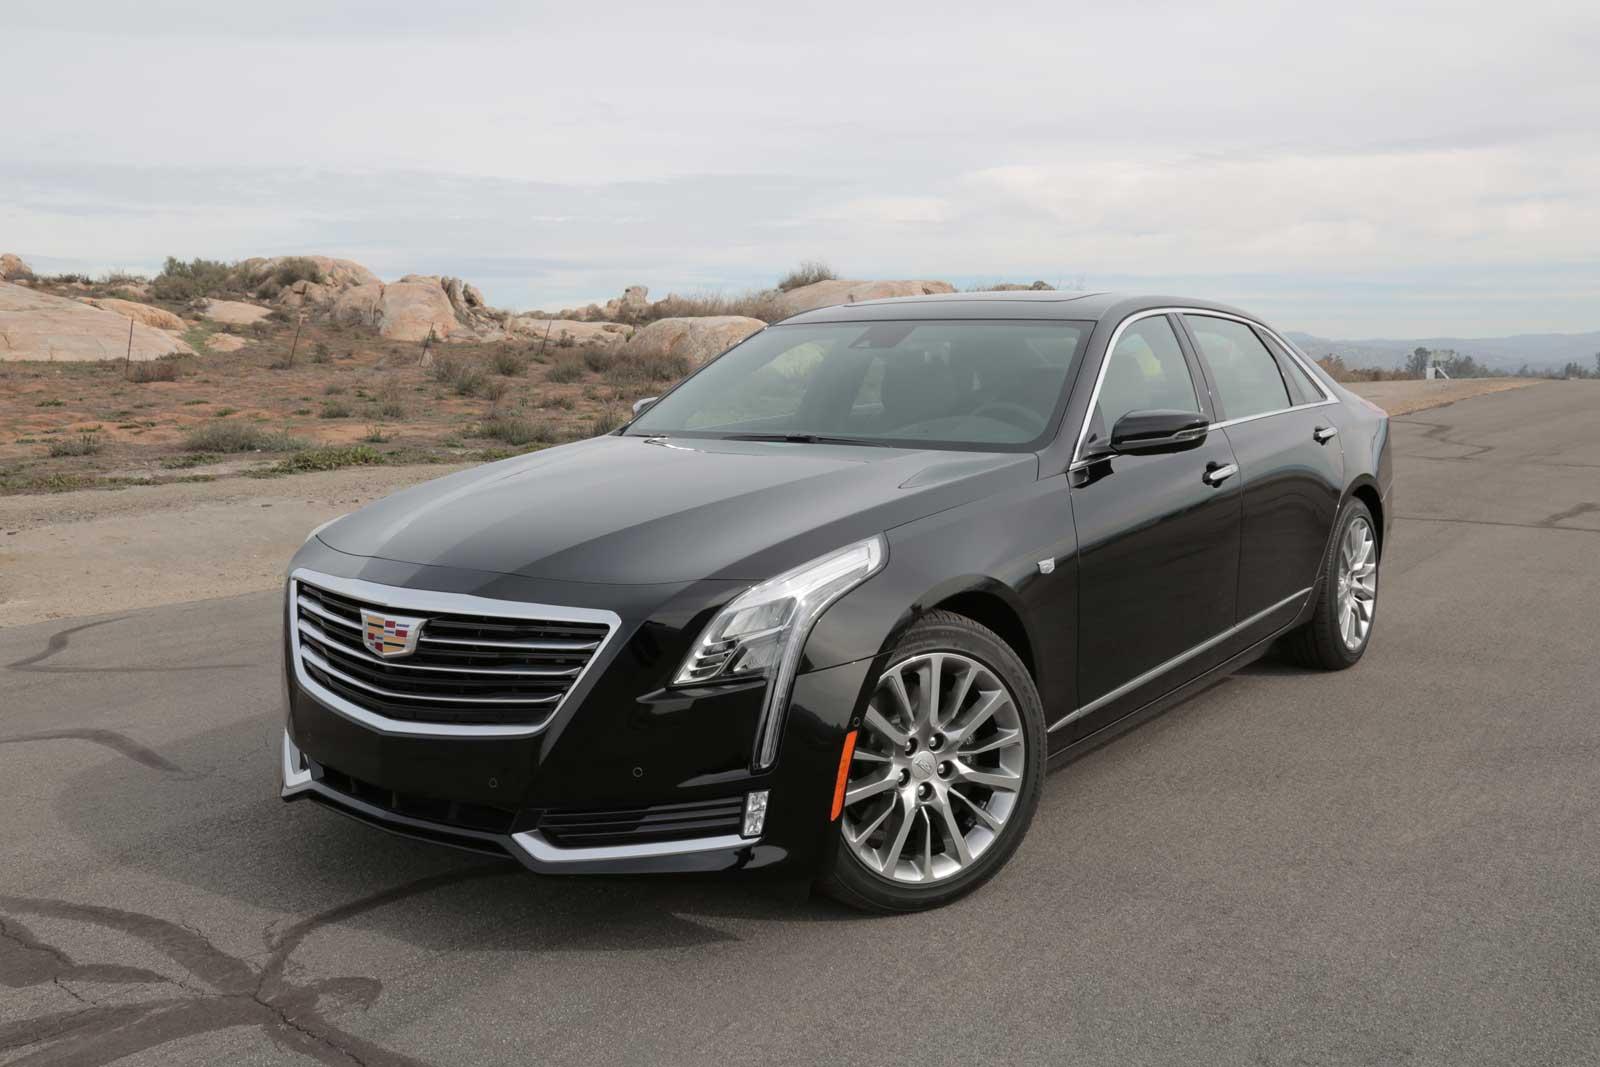 2016-Cadillac-CT6-Front-05